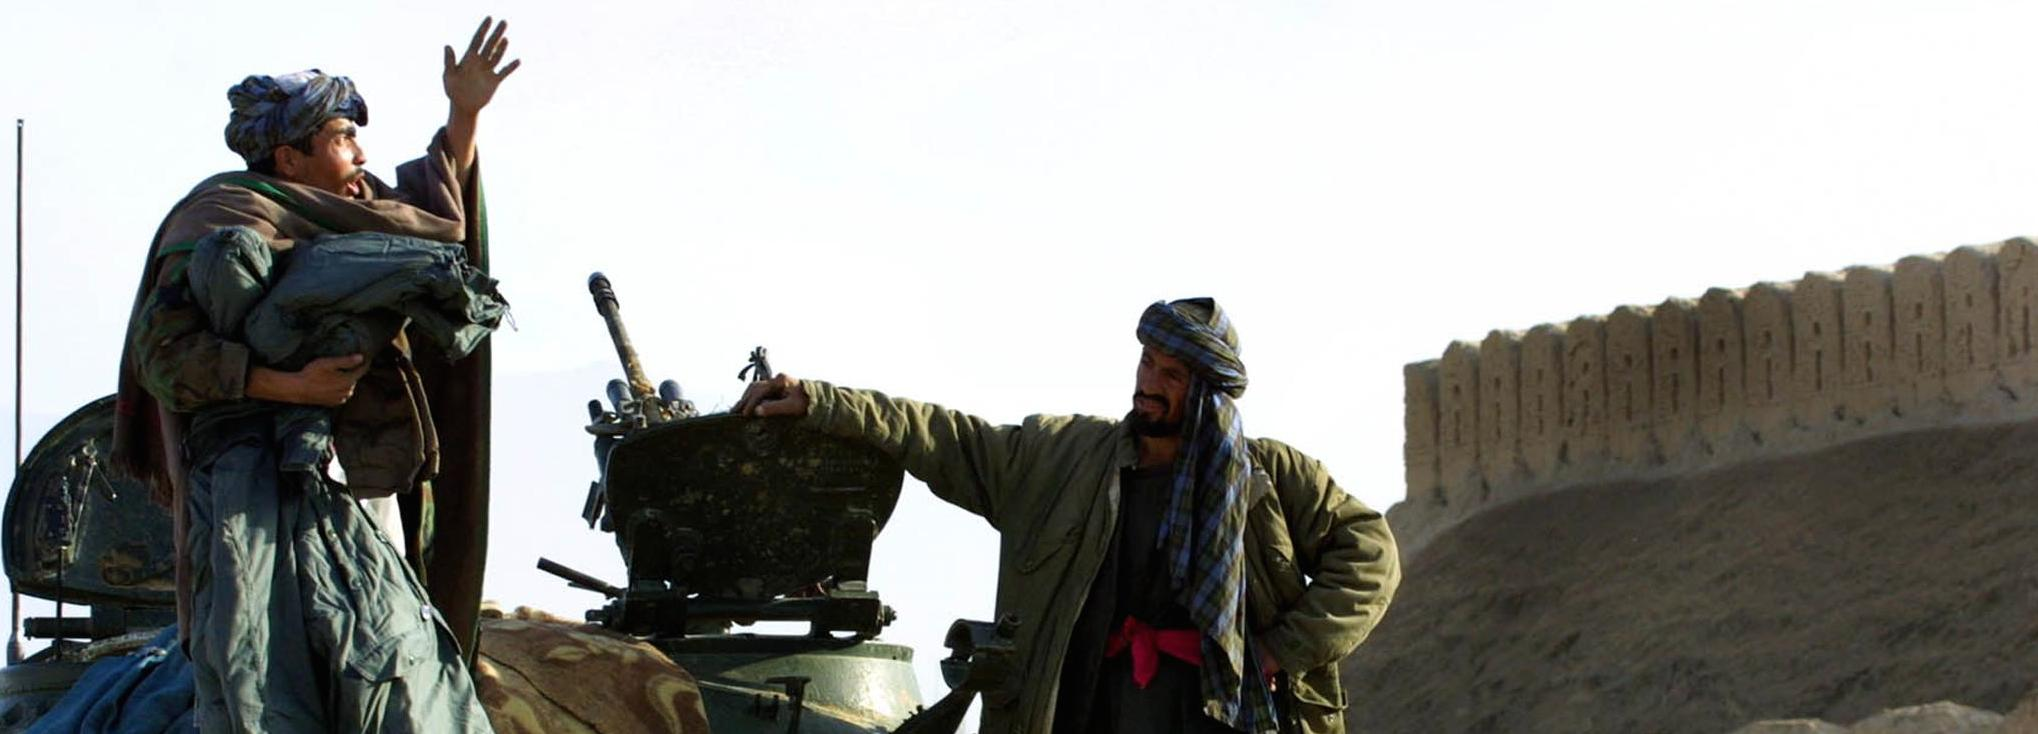 Combattenti afghani